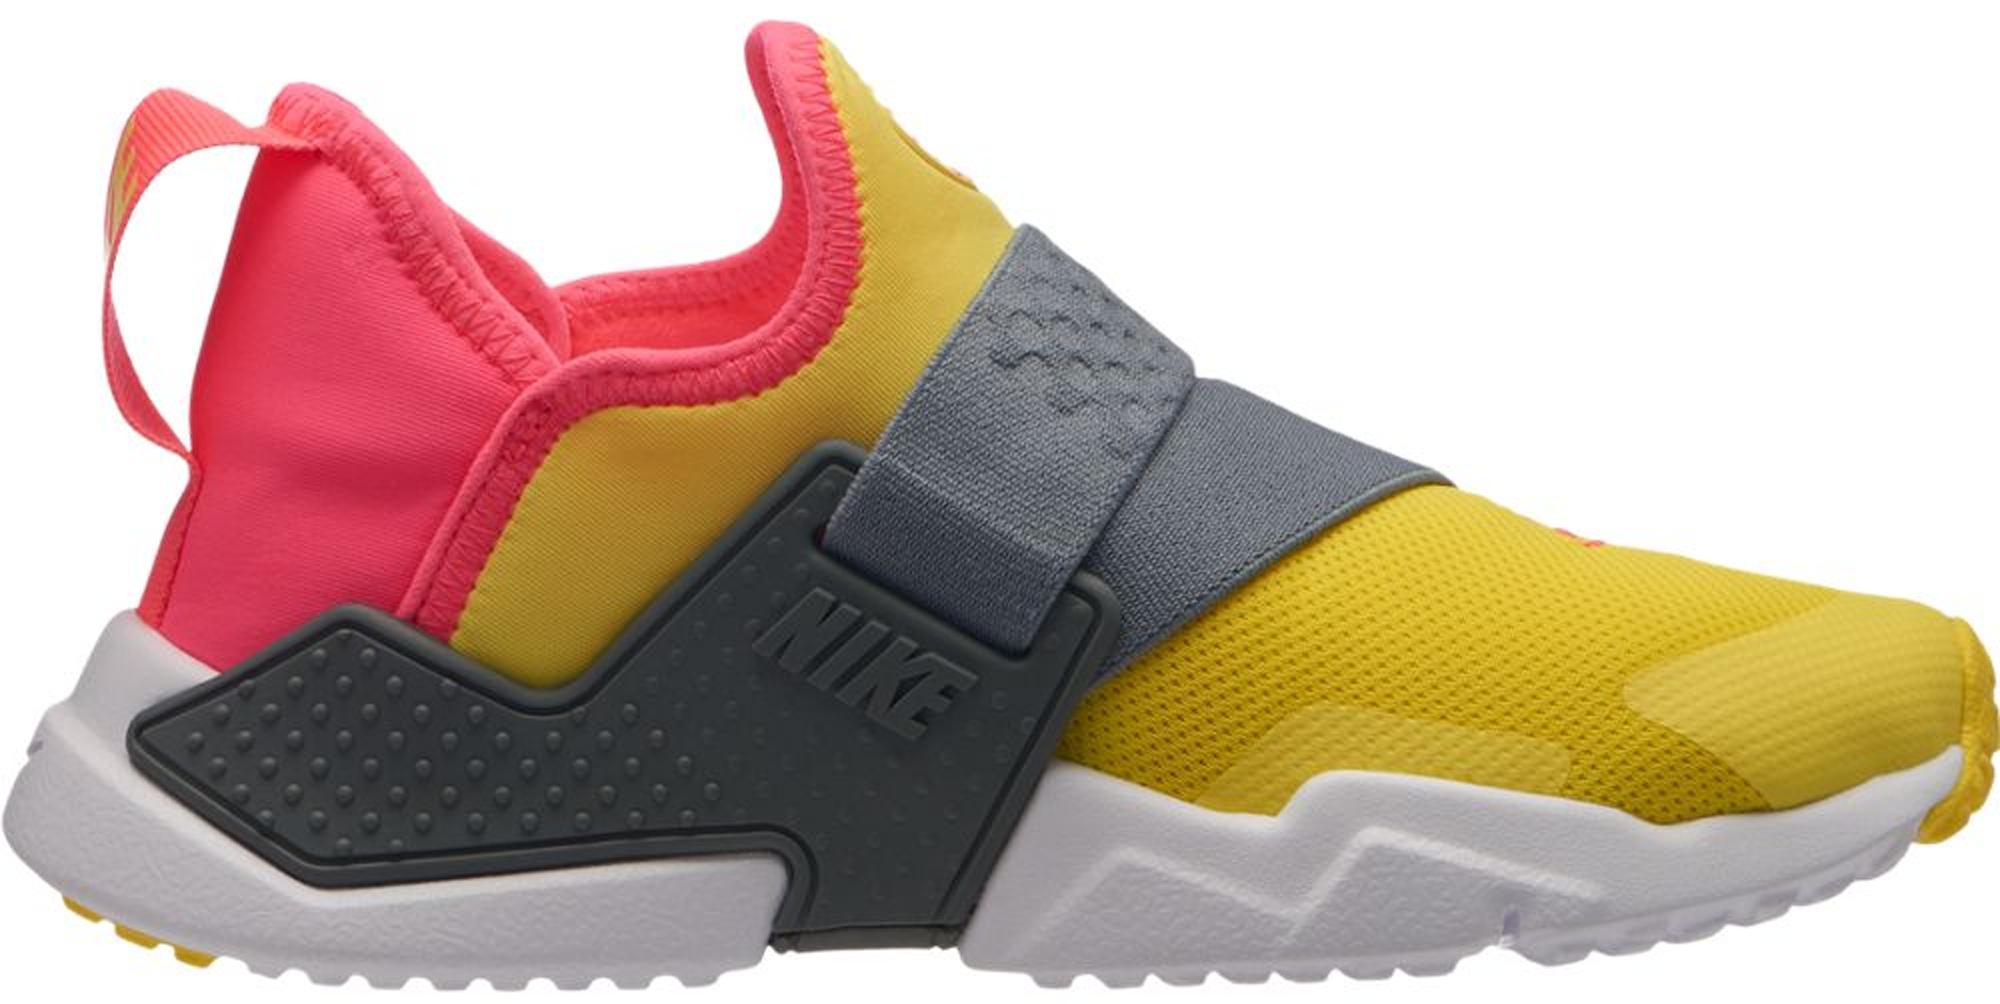 Nike Huarache Extreme Dynamic Yellow